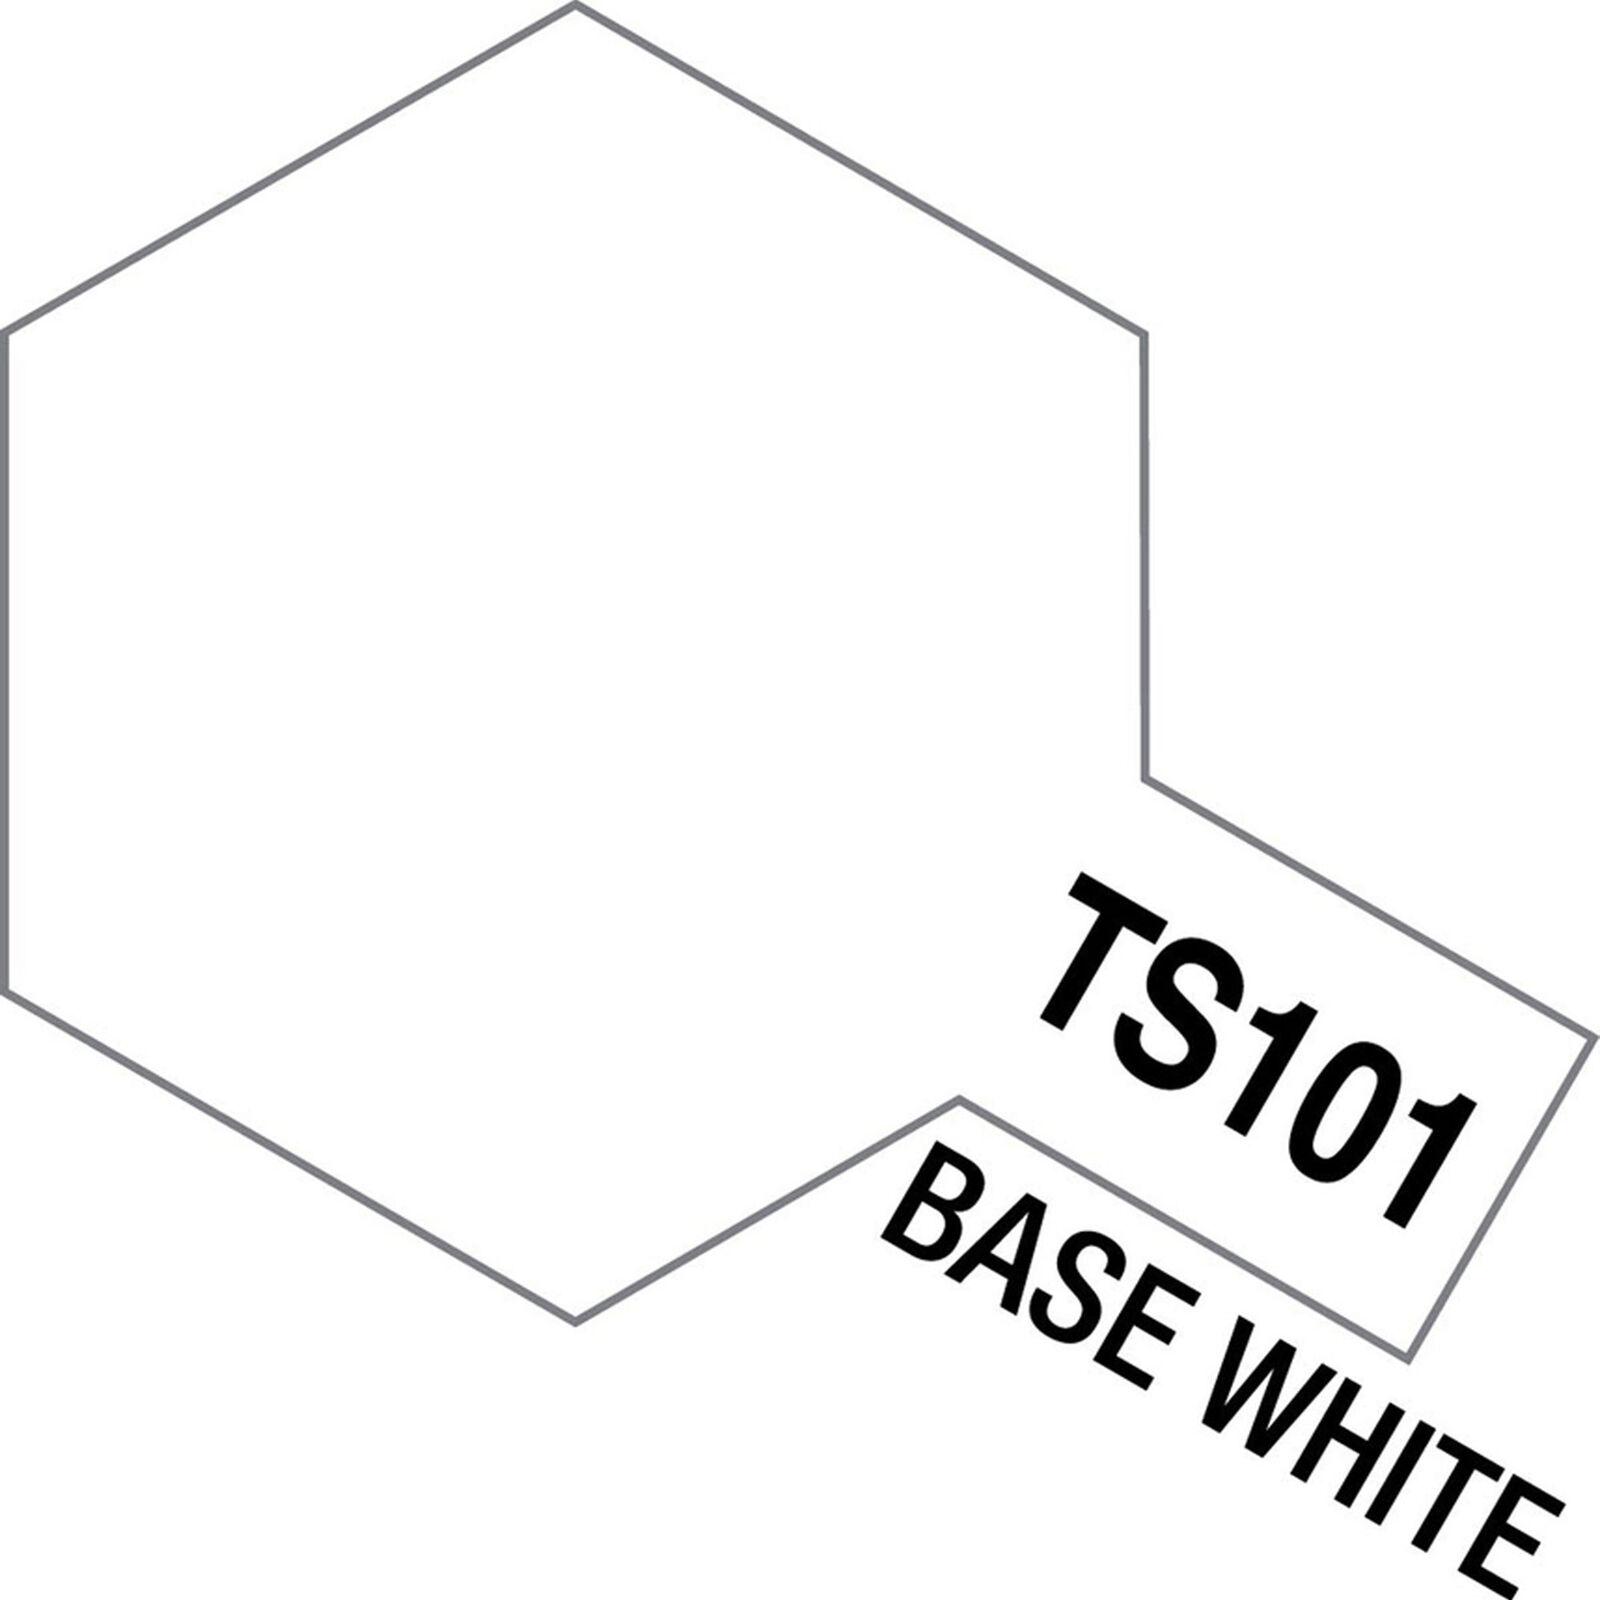 TS-101 Base White, 100ml Spray Can